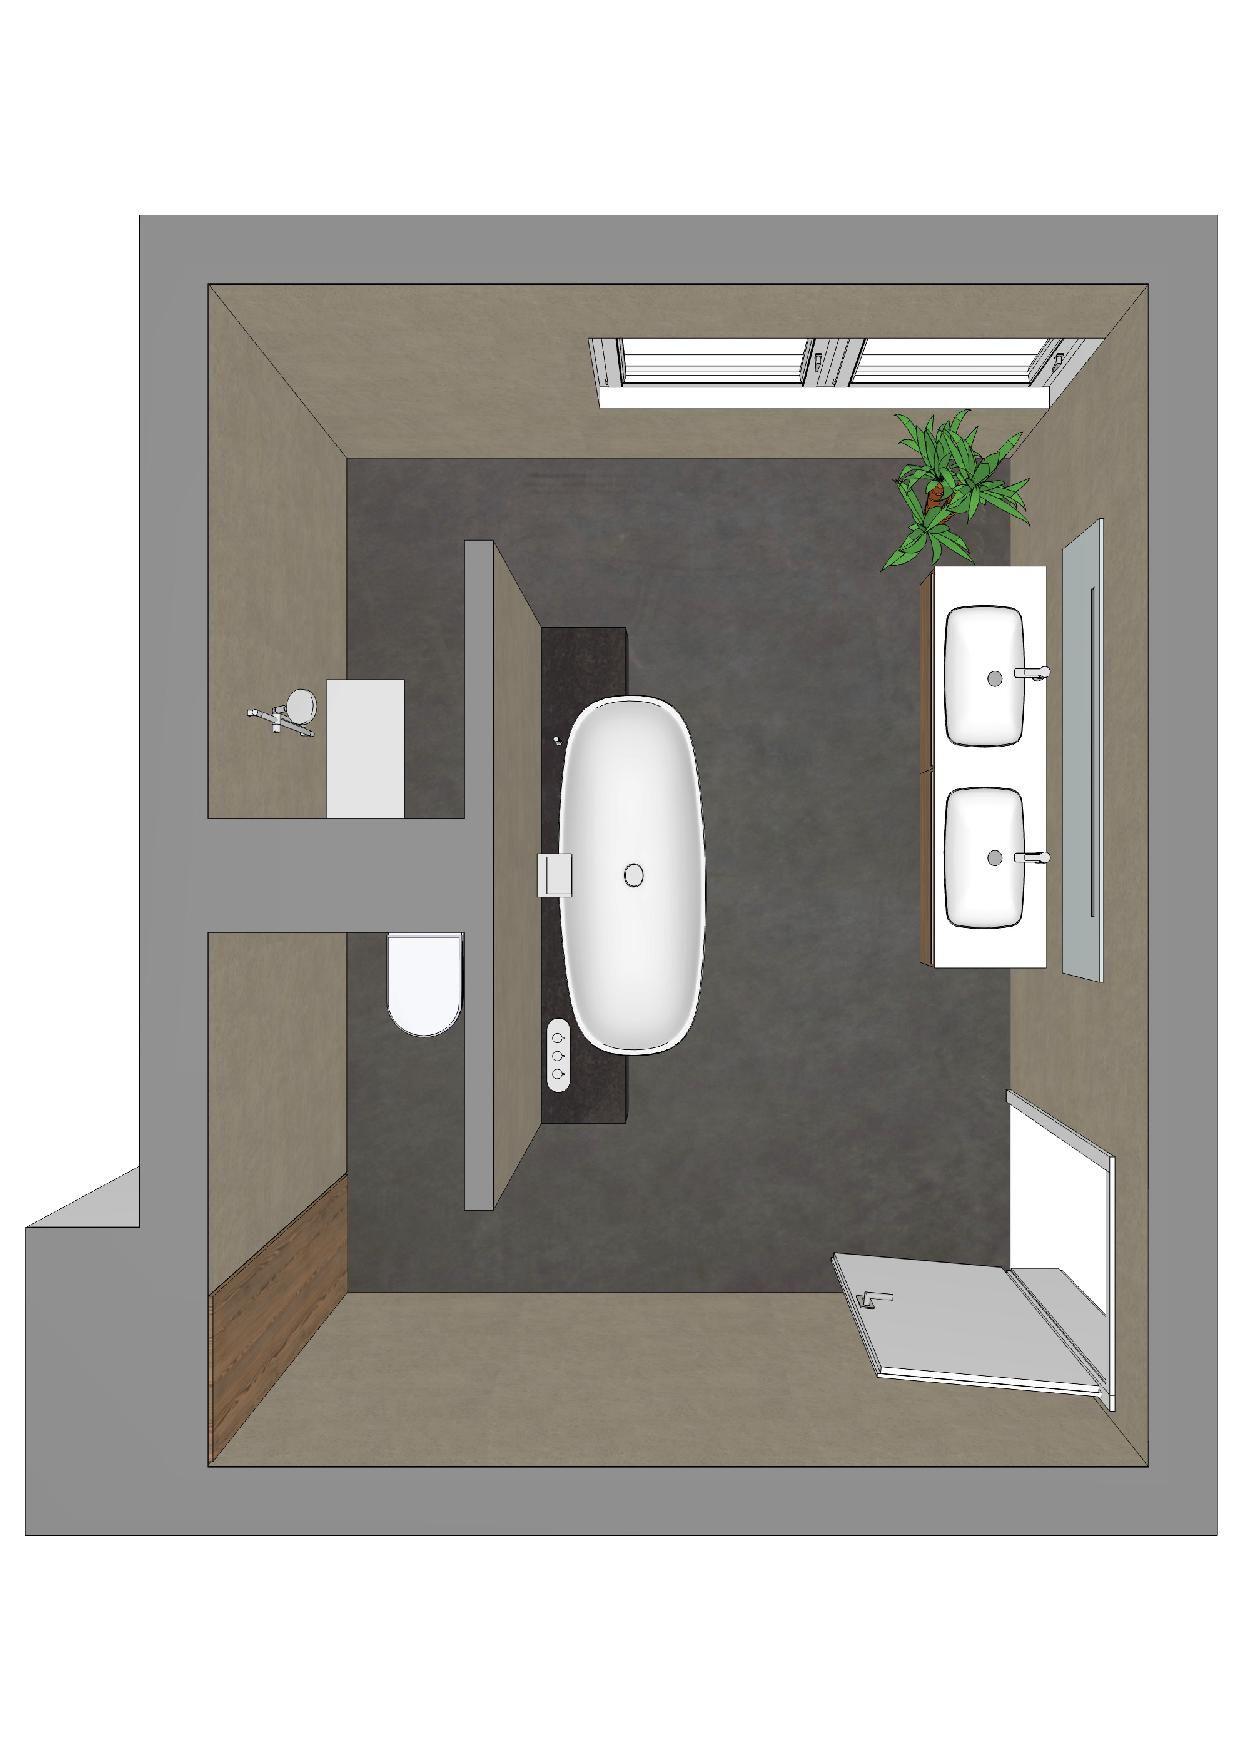 Badezimmer T Grundriss Badezimmer T Wand Drewkasunic Designs